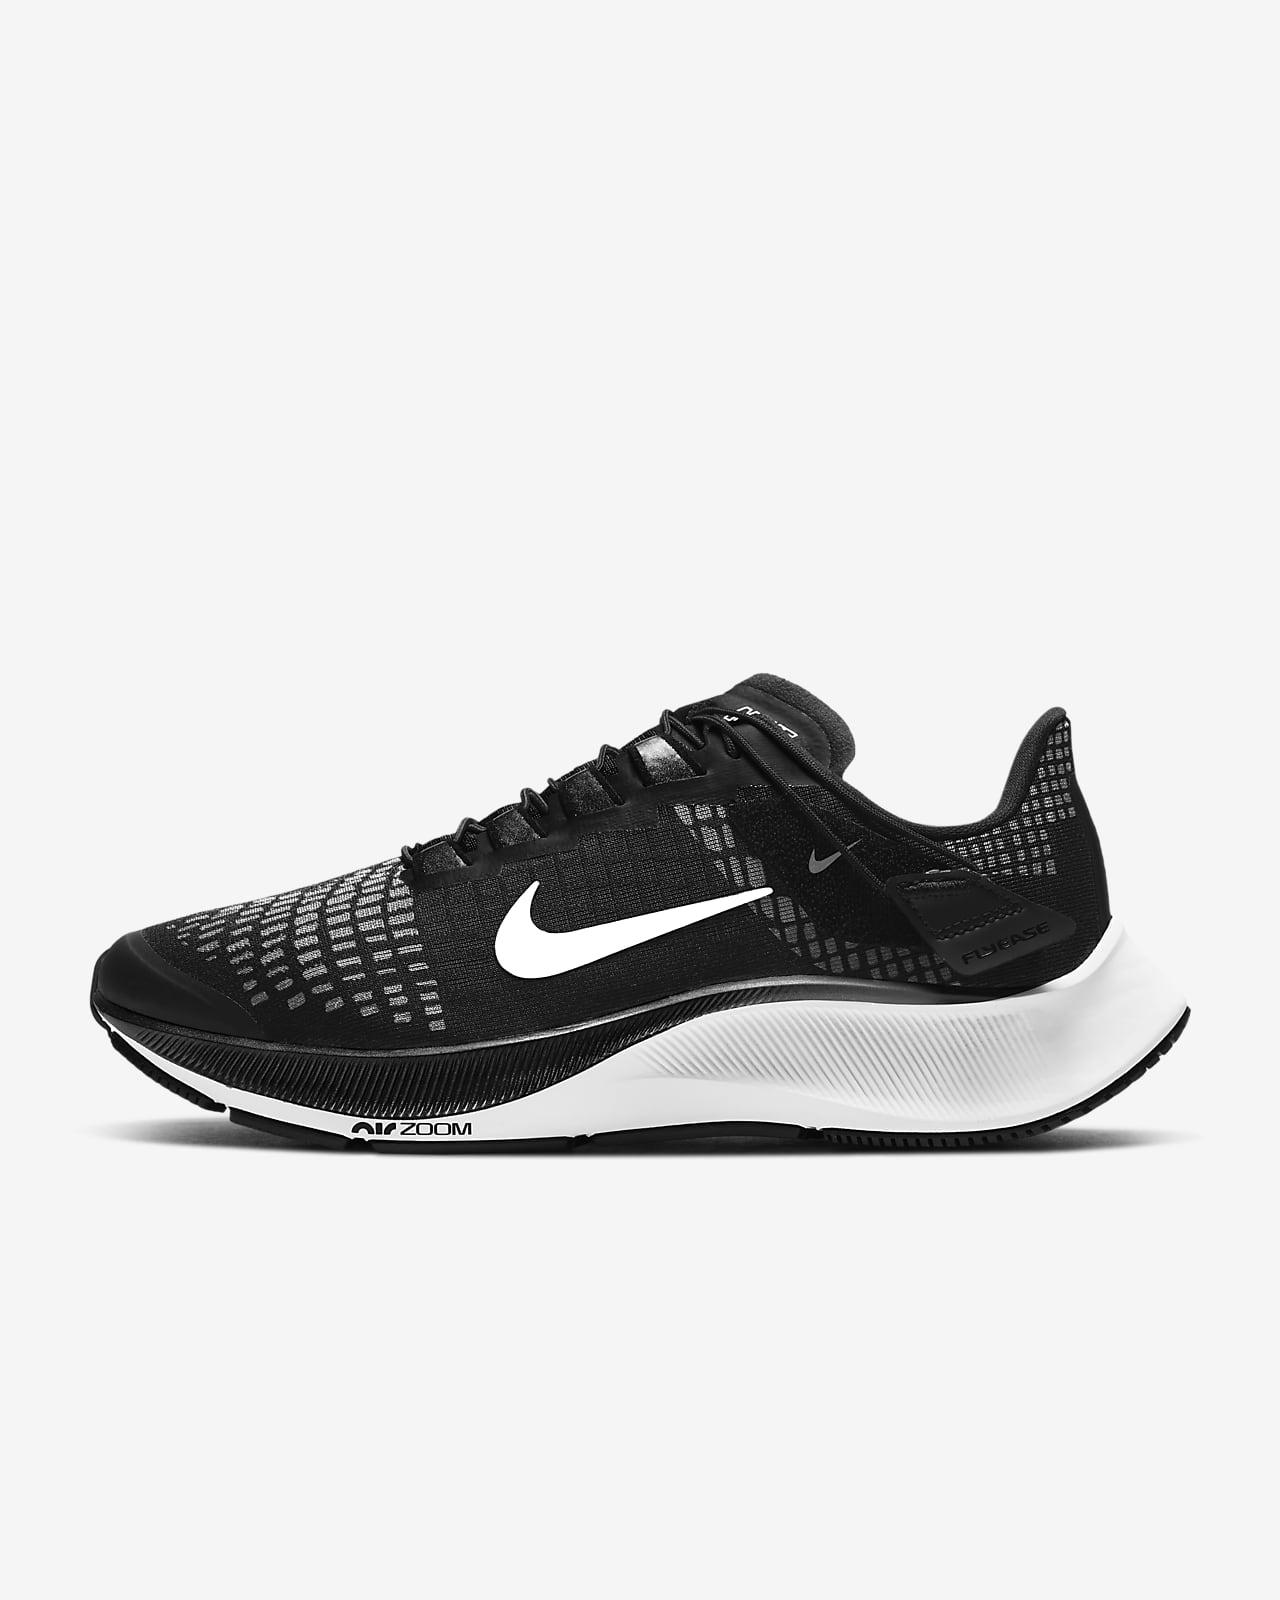 Calzado de running para mujer (ancho) Nike Air Zoom Pegasus 37 FlyEase